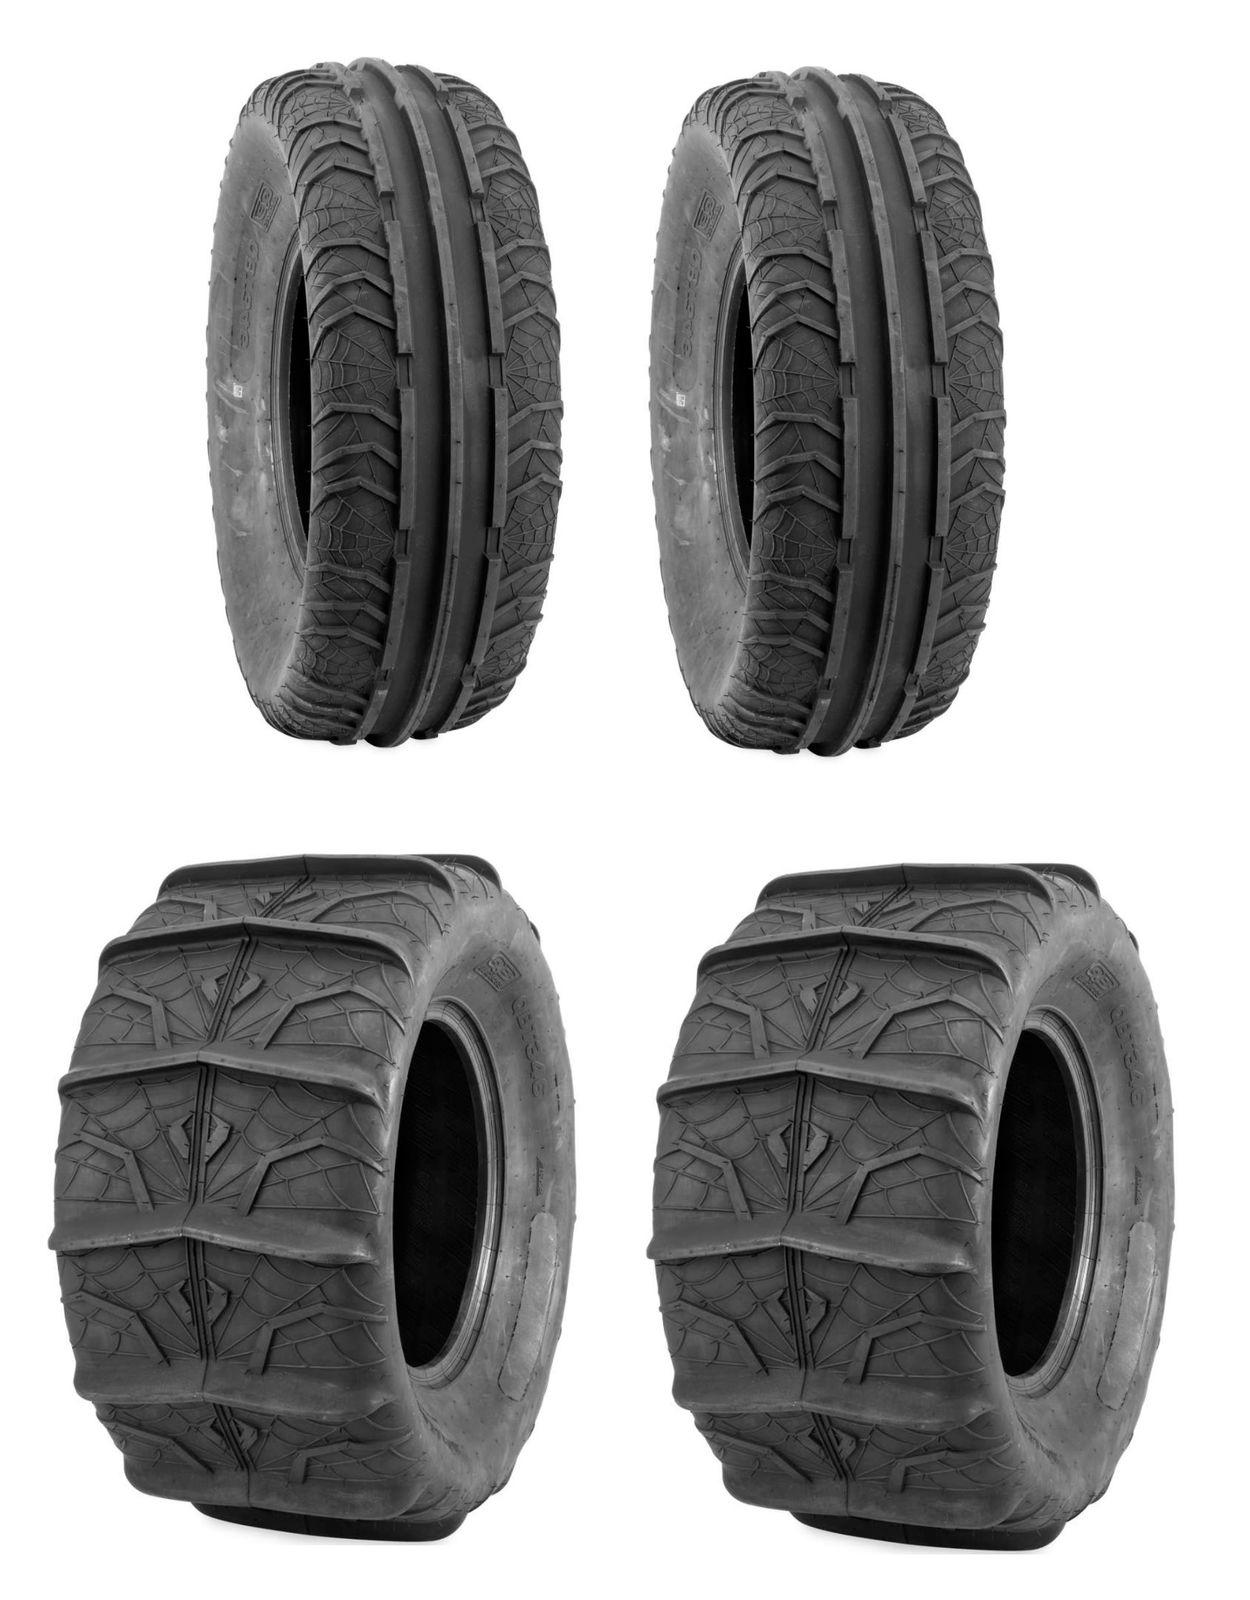 Pair QuadBoss UTV SXS Sand Dune Rear Paddle Tires QBT346 6 Ply 28X13-14